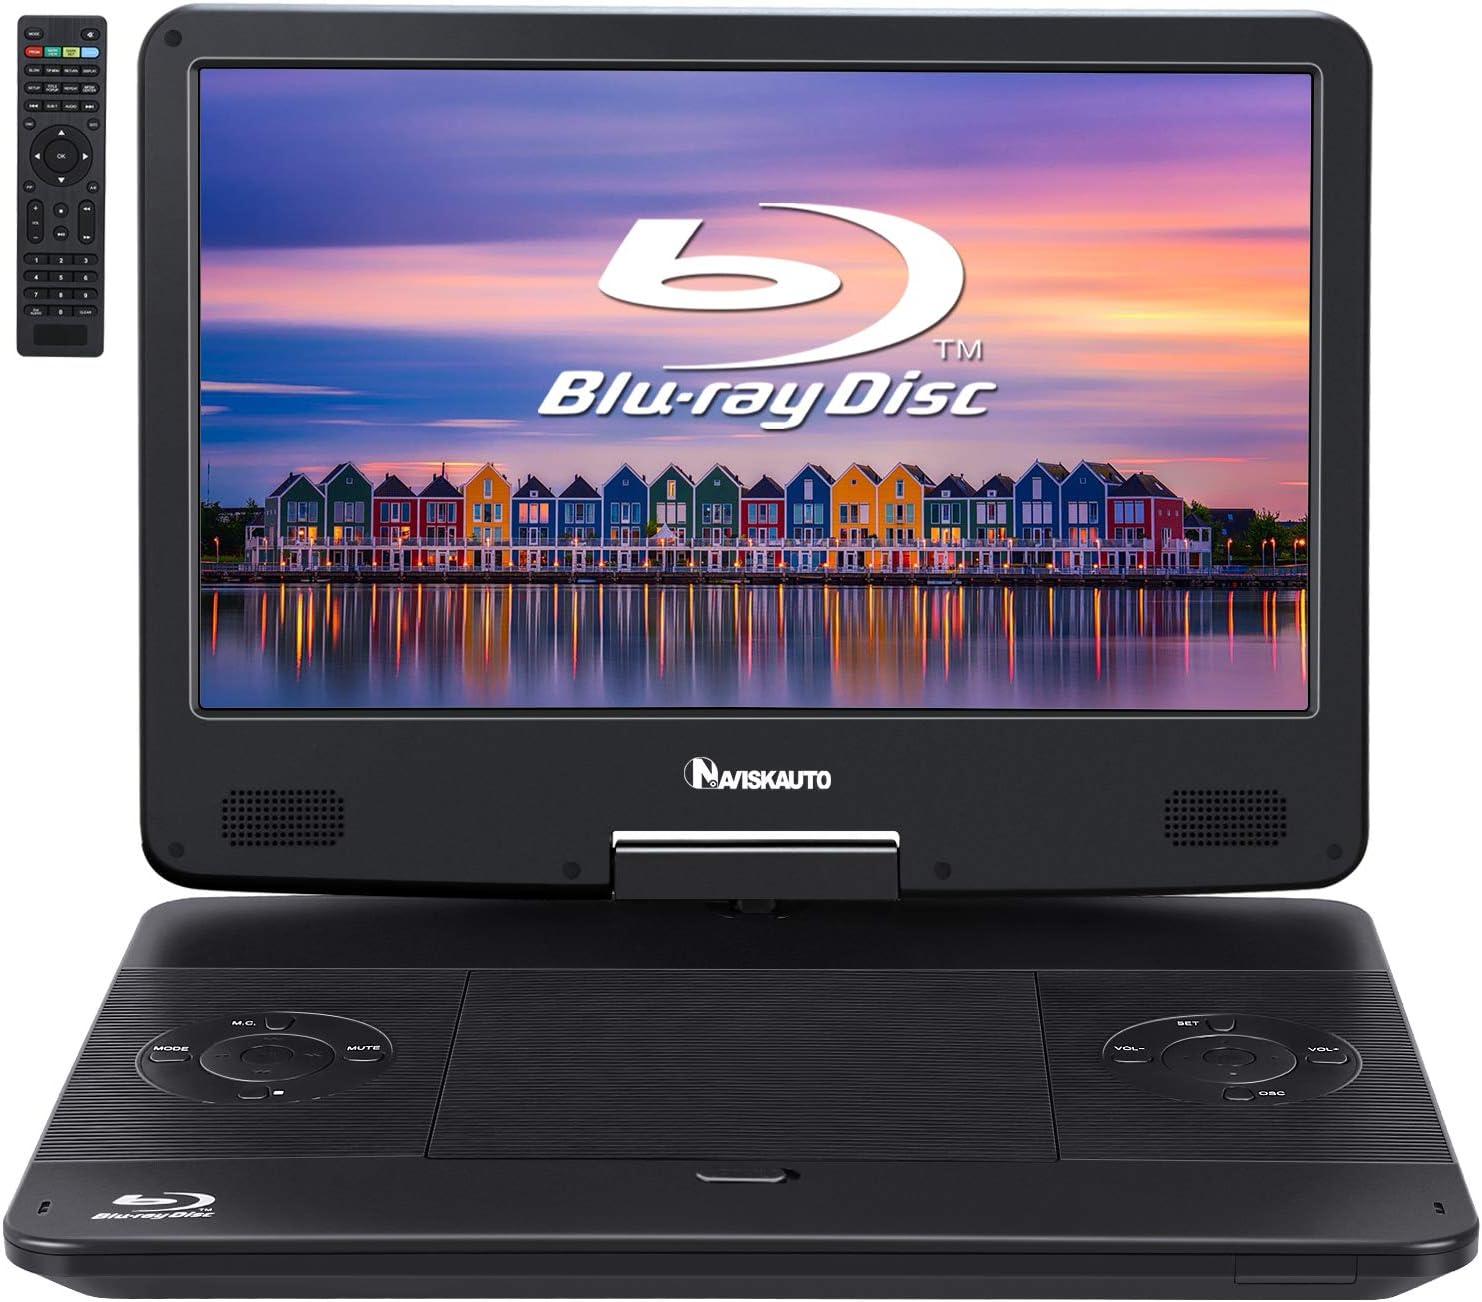 Akku-Blu-ray-Player Auto-DVD-Player Portable Mobile DVD-Player HD 14.1 Zoll-Video-Player mit TV-EVD LUONE Tragbarer DVD-Player